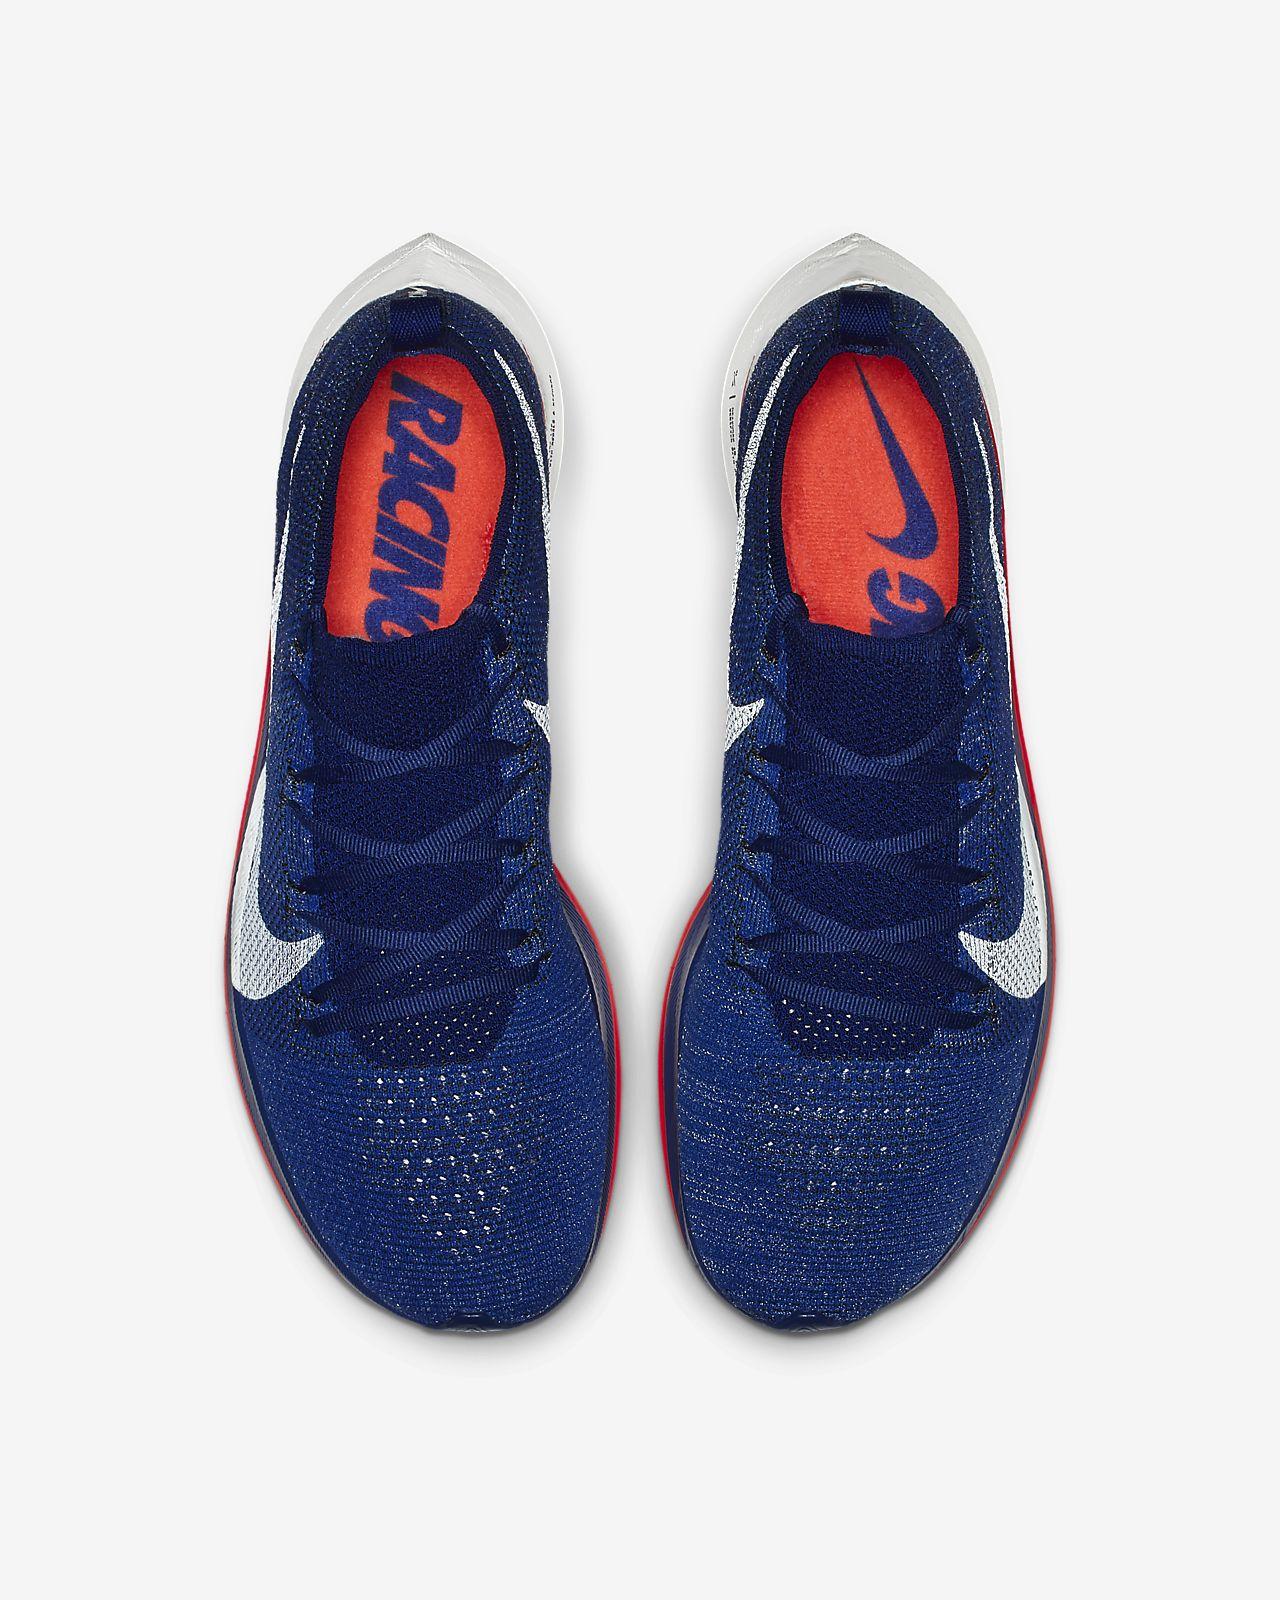 new product fe1c9 42e96 ... Scarpa da running Nike Vaporfly 4% Flyknit